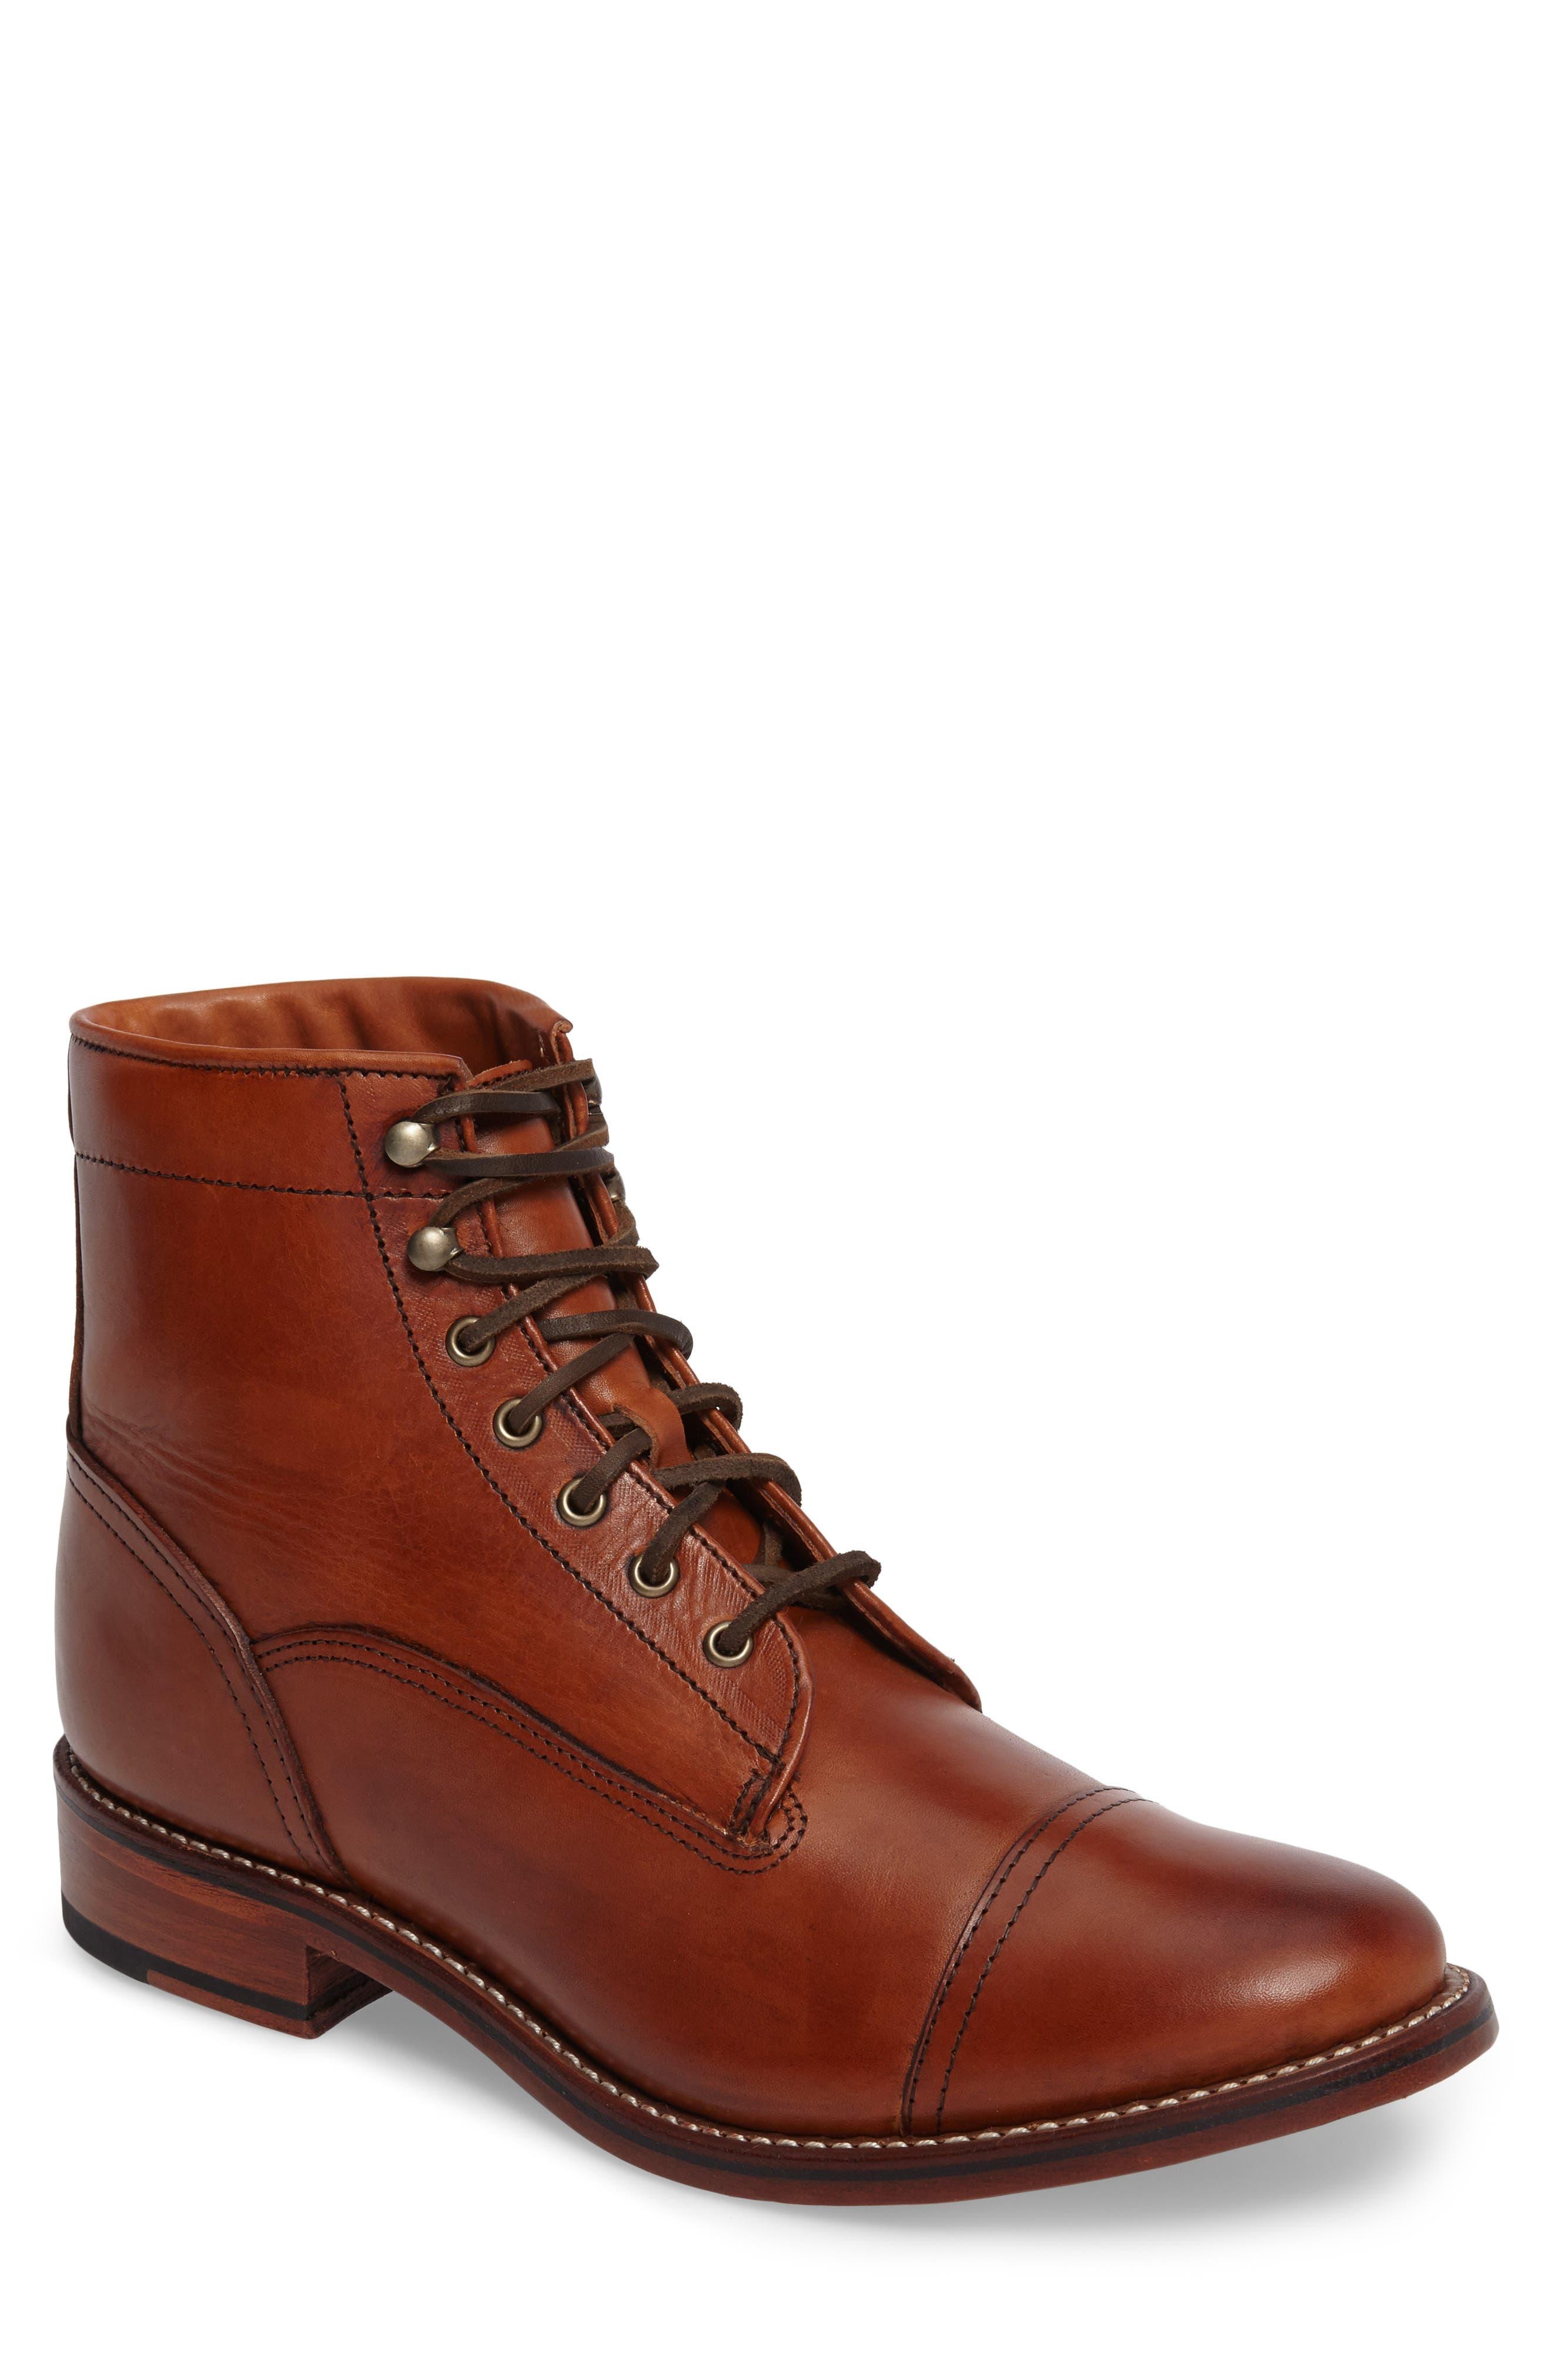 Alternate Image 1 Selected - Ariat Highlands Cap Toe Boot (Men)